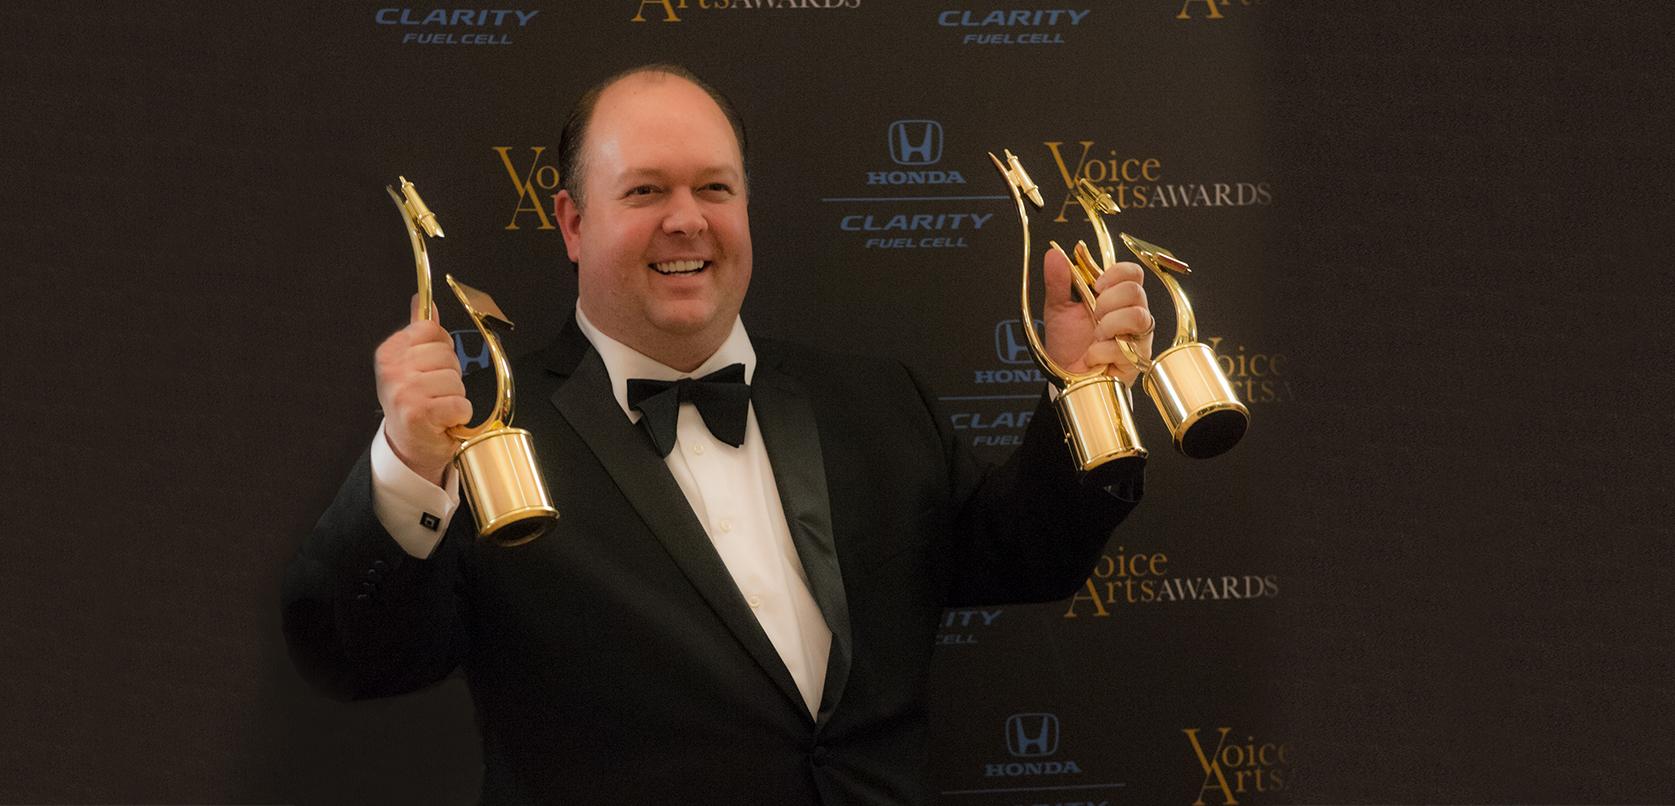 J. Michael Collins, multiple winner Voice Arts Awards